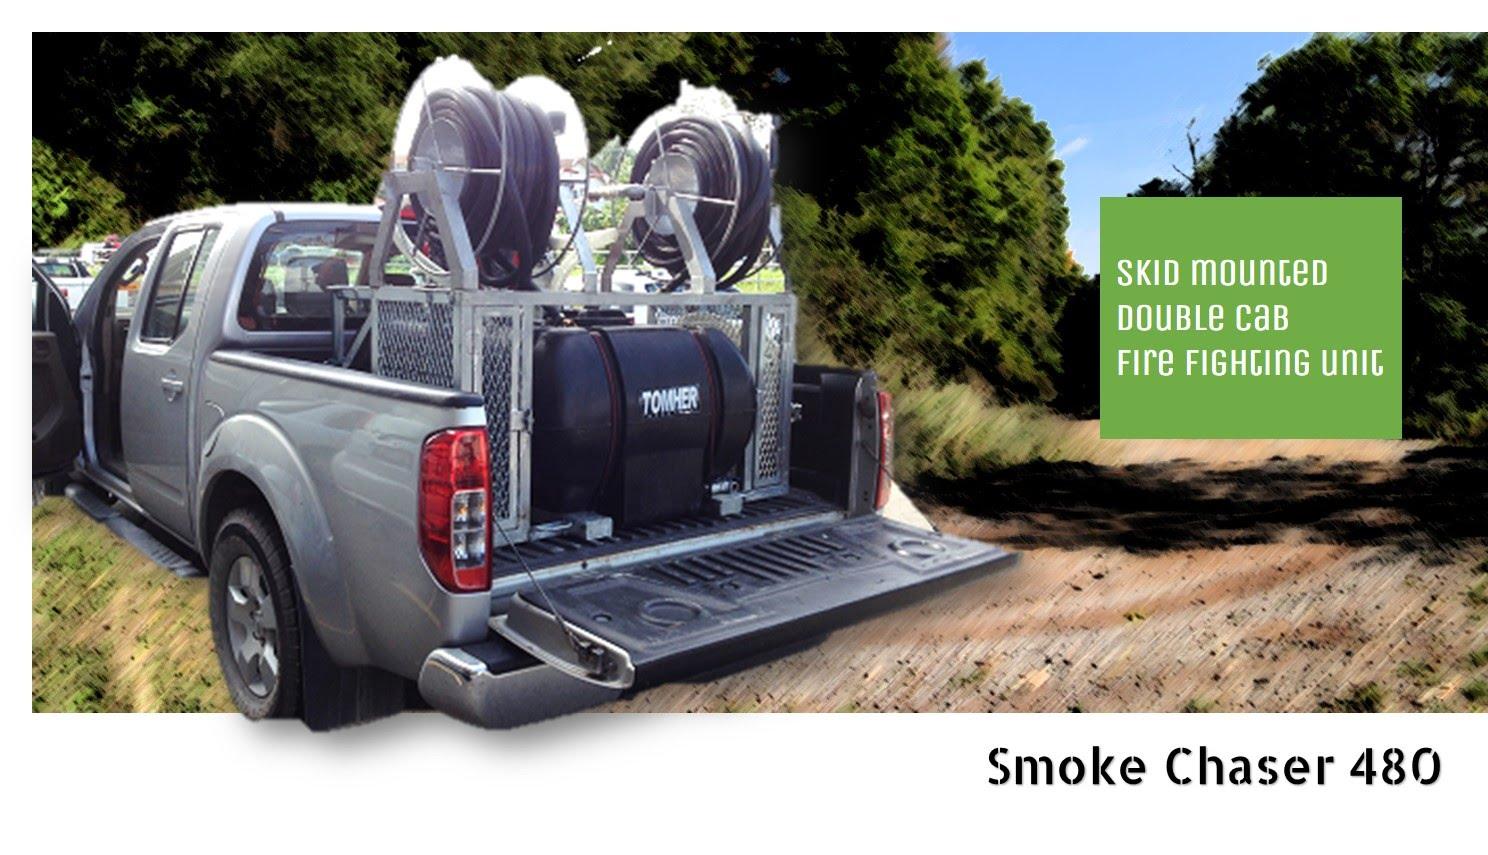 Smoke Chaser 480